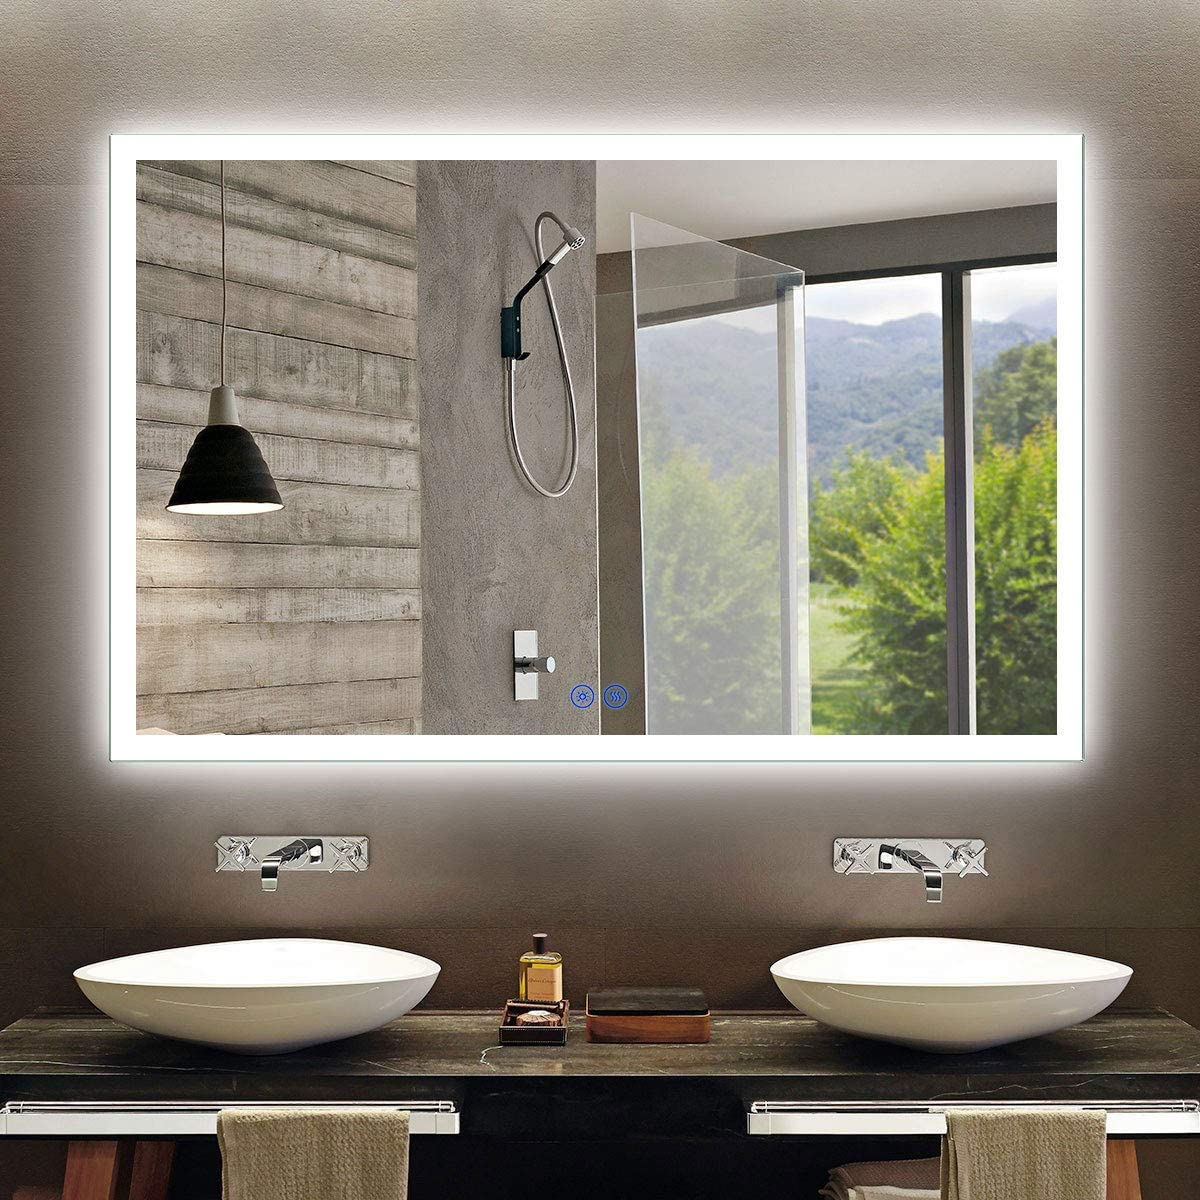 Amazon Com Large Horizontal Rectangle Mirror Led Illuminated Backlit Wall Mount Bathroom Vanity Mirrors Hotel Office Bar Mirror 55 X 36 Inch D N031 C Kitchen Dining